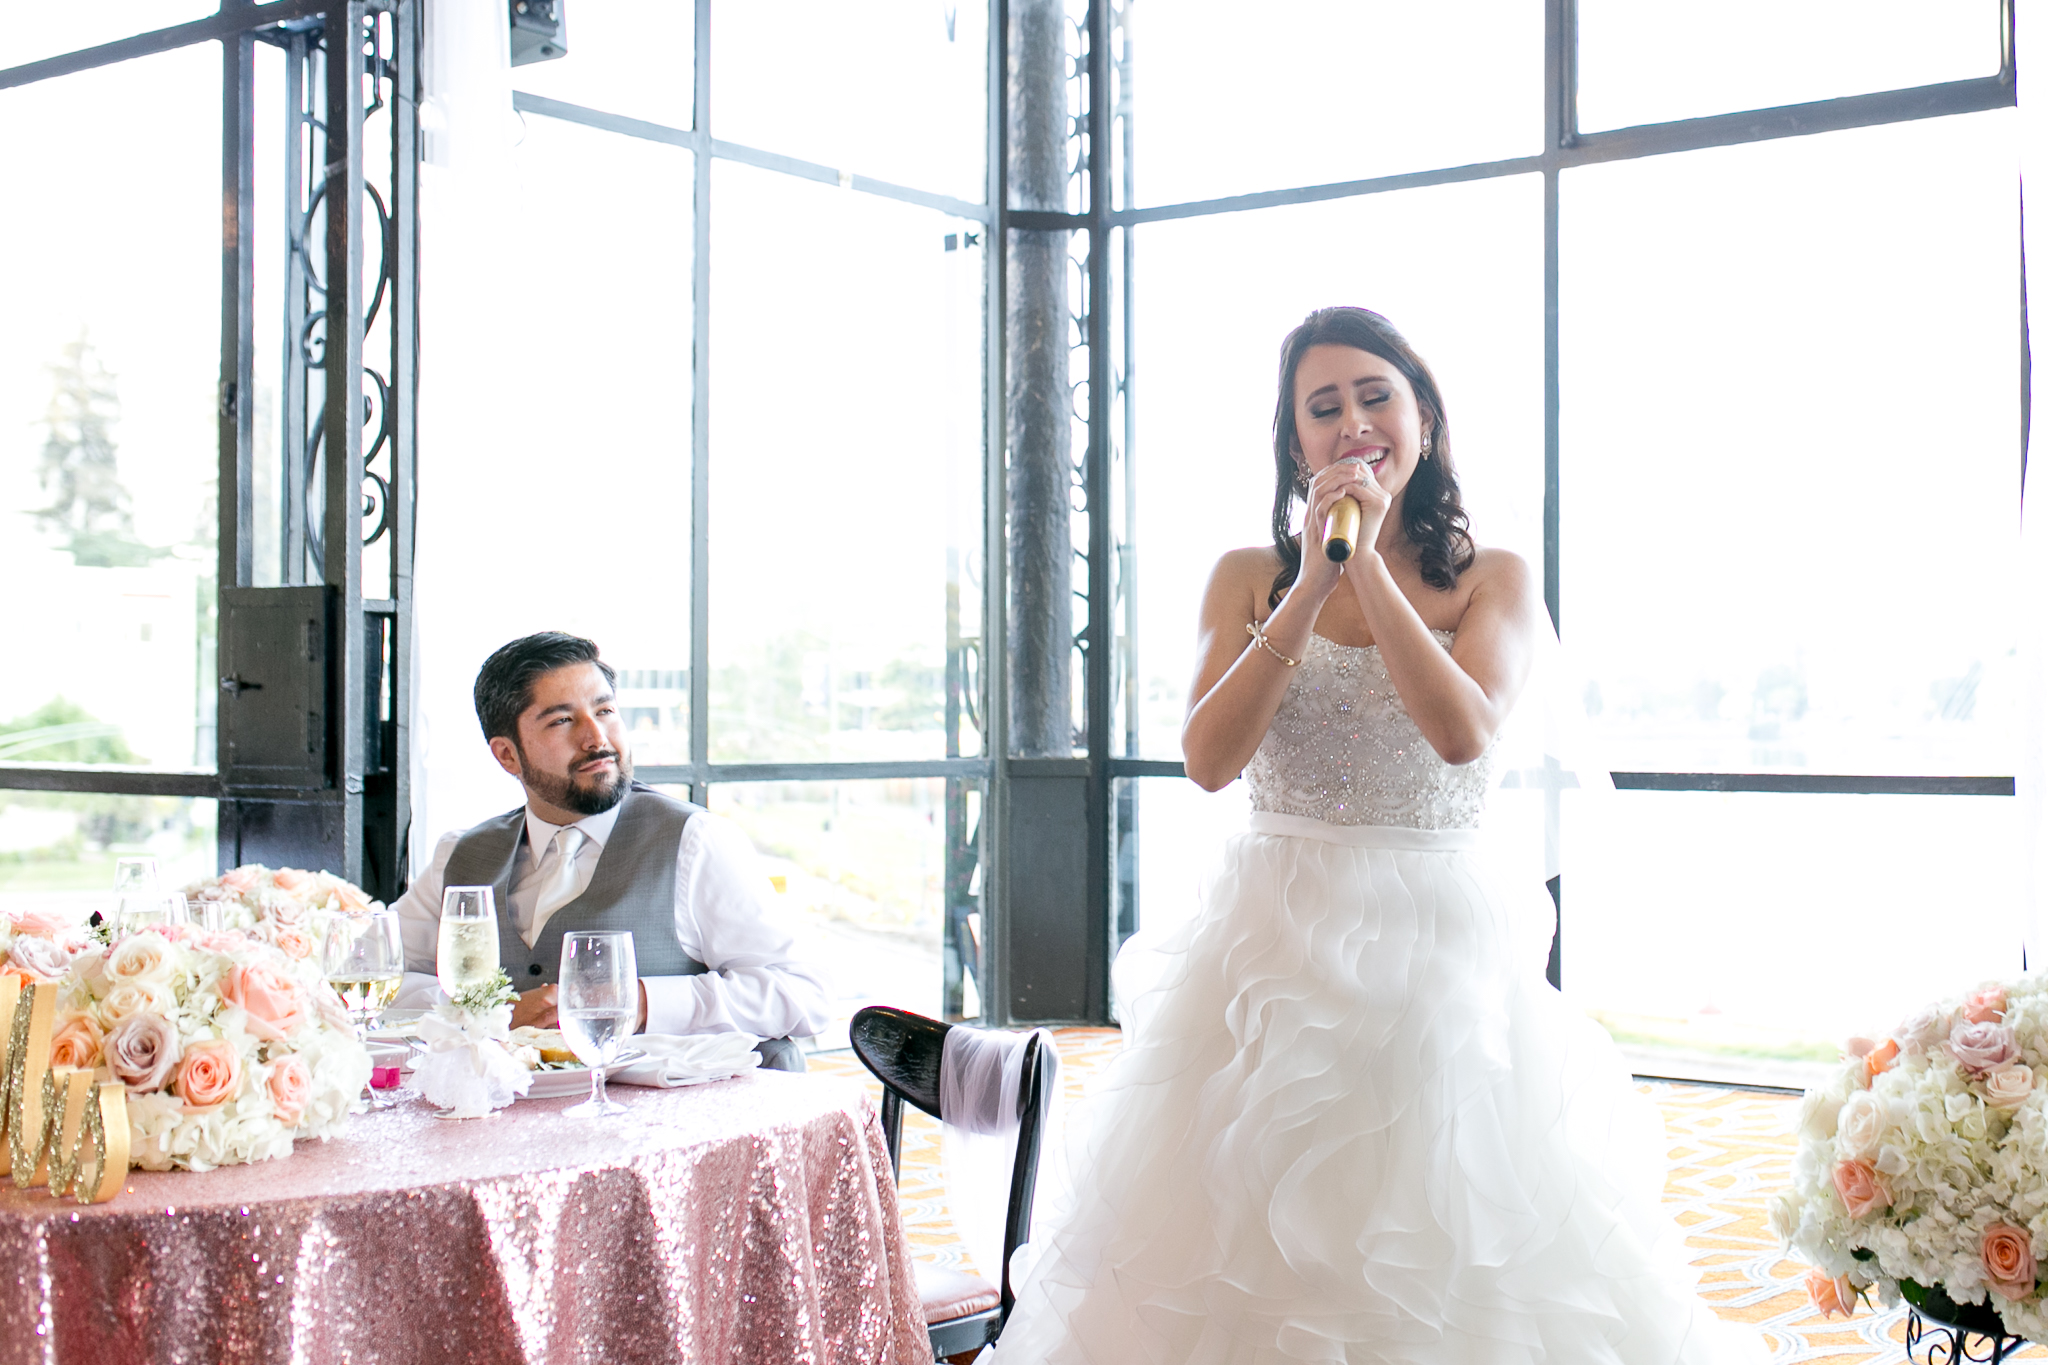 Oakland/Berkeley Wedding Photography - Michelle Chang Photography